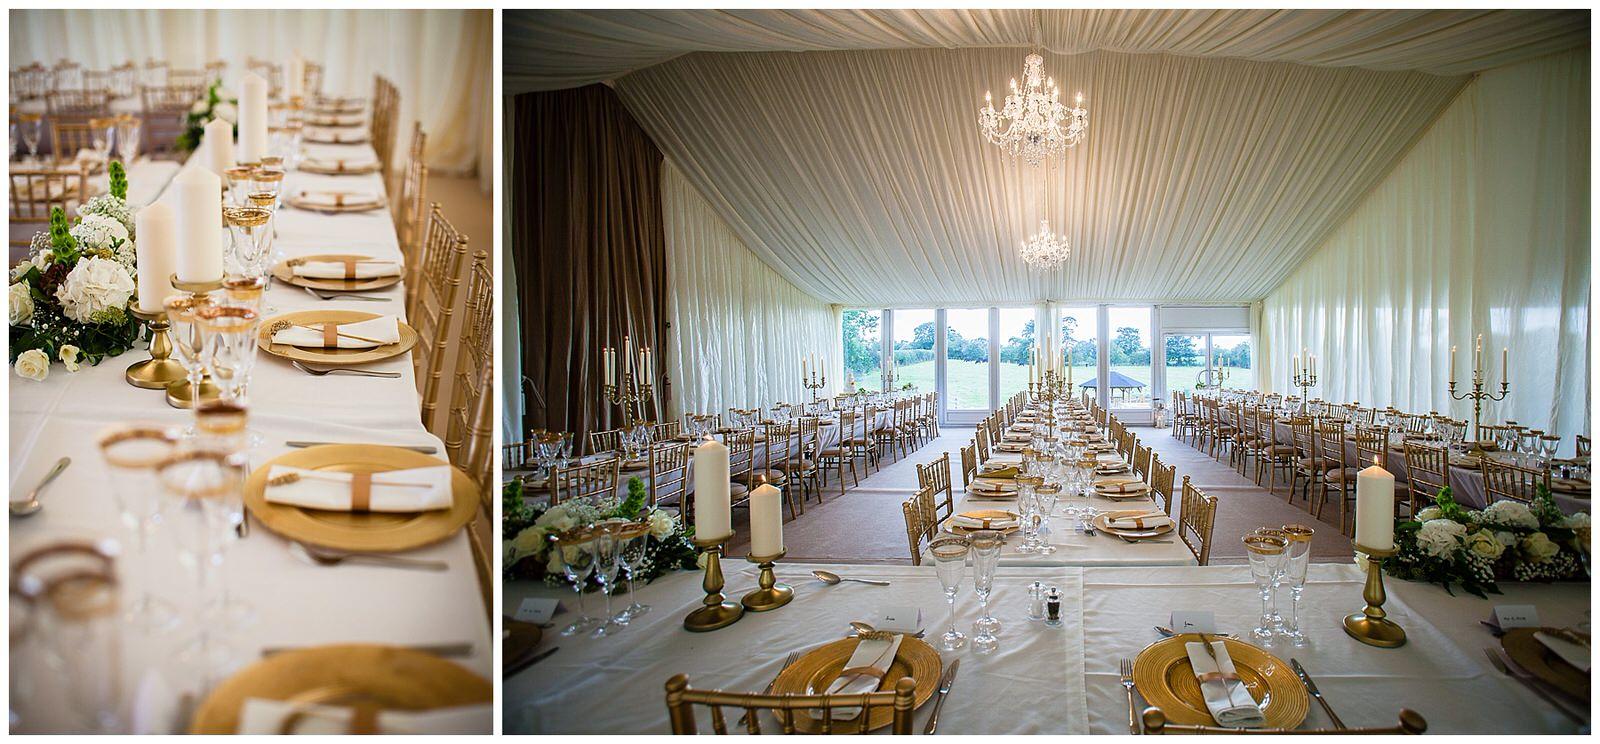 October Gold themed marquee wedding - Shropshire Wedding Photographer